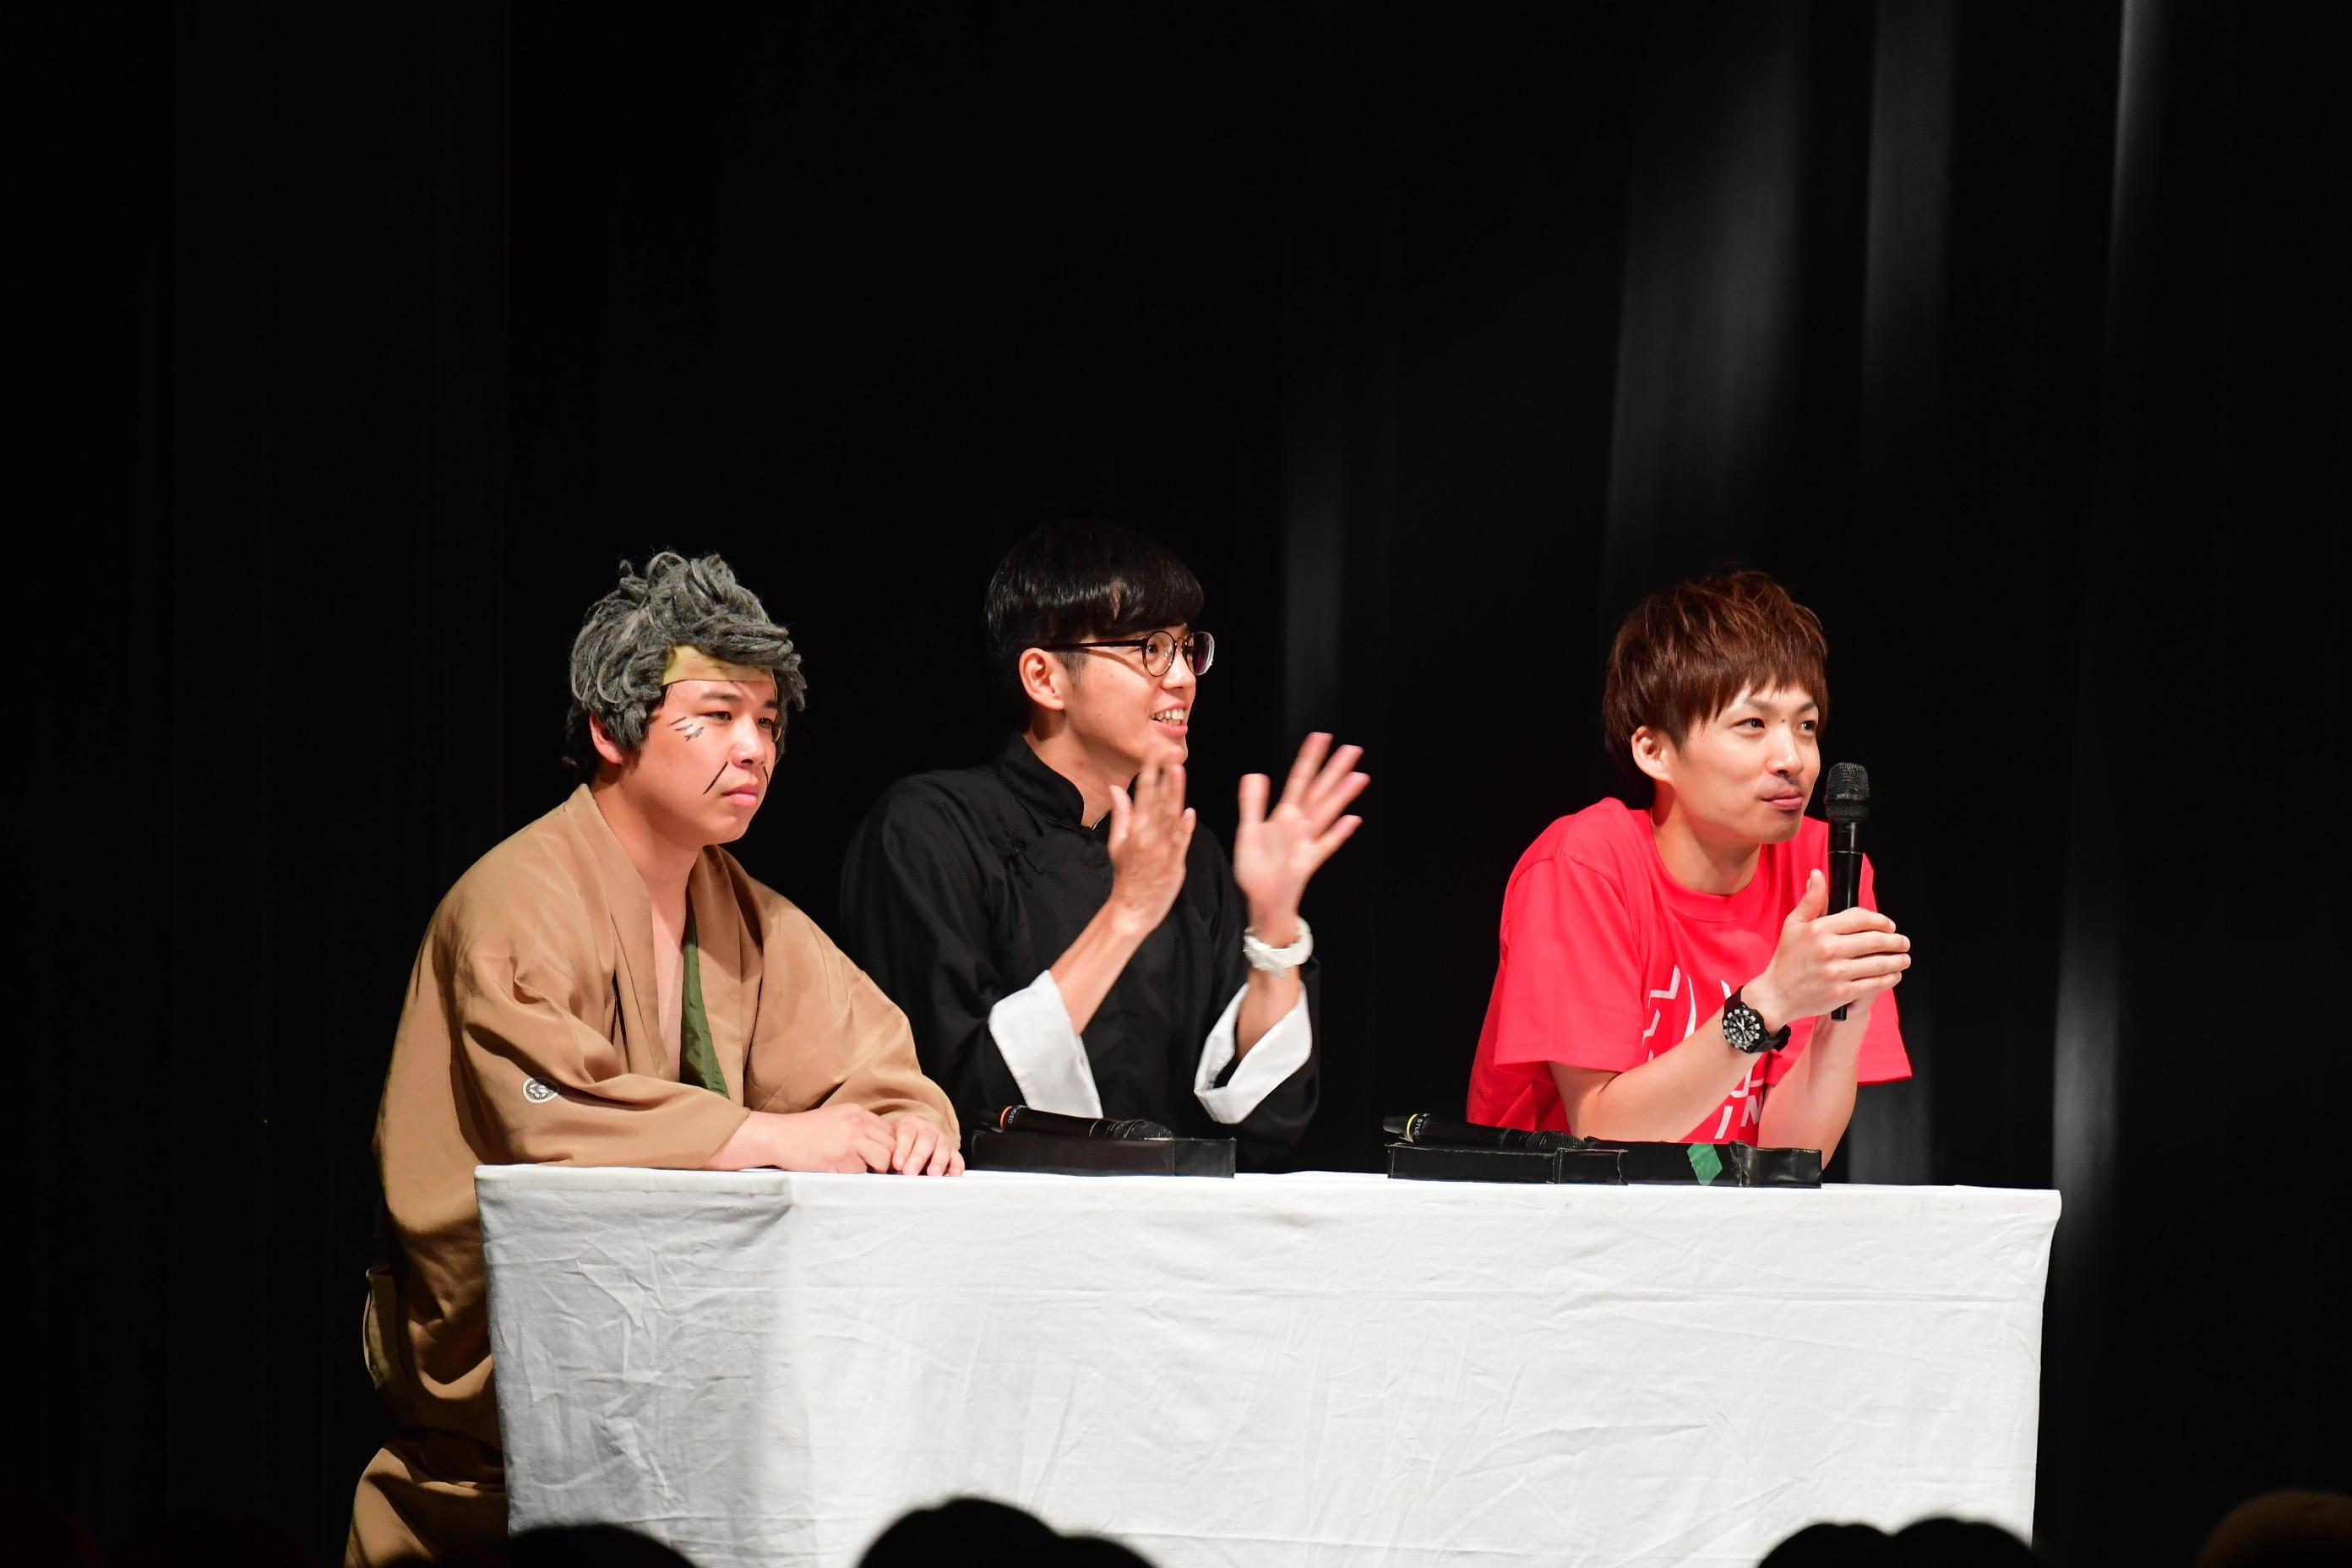 http://news.yoshimoto.co.jp/20180803010728-ea63707319164dc3410286f758ec5d375a2d9e76.jpg